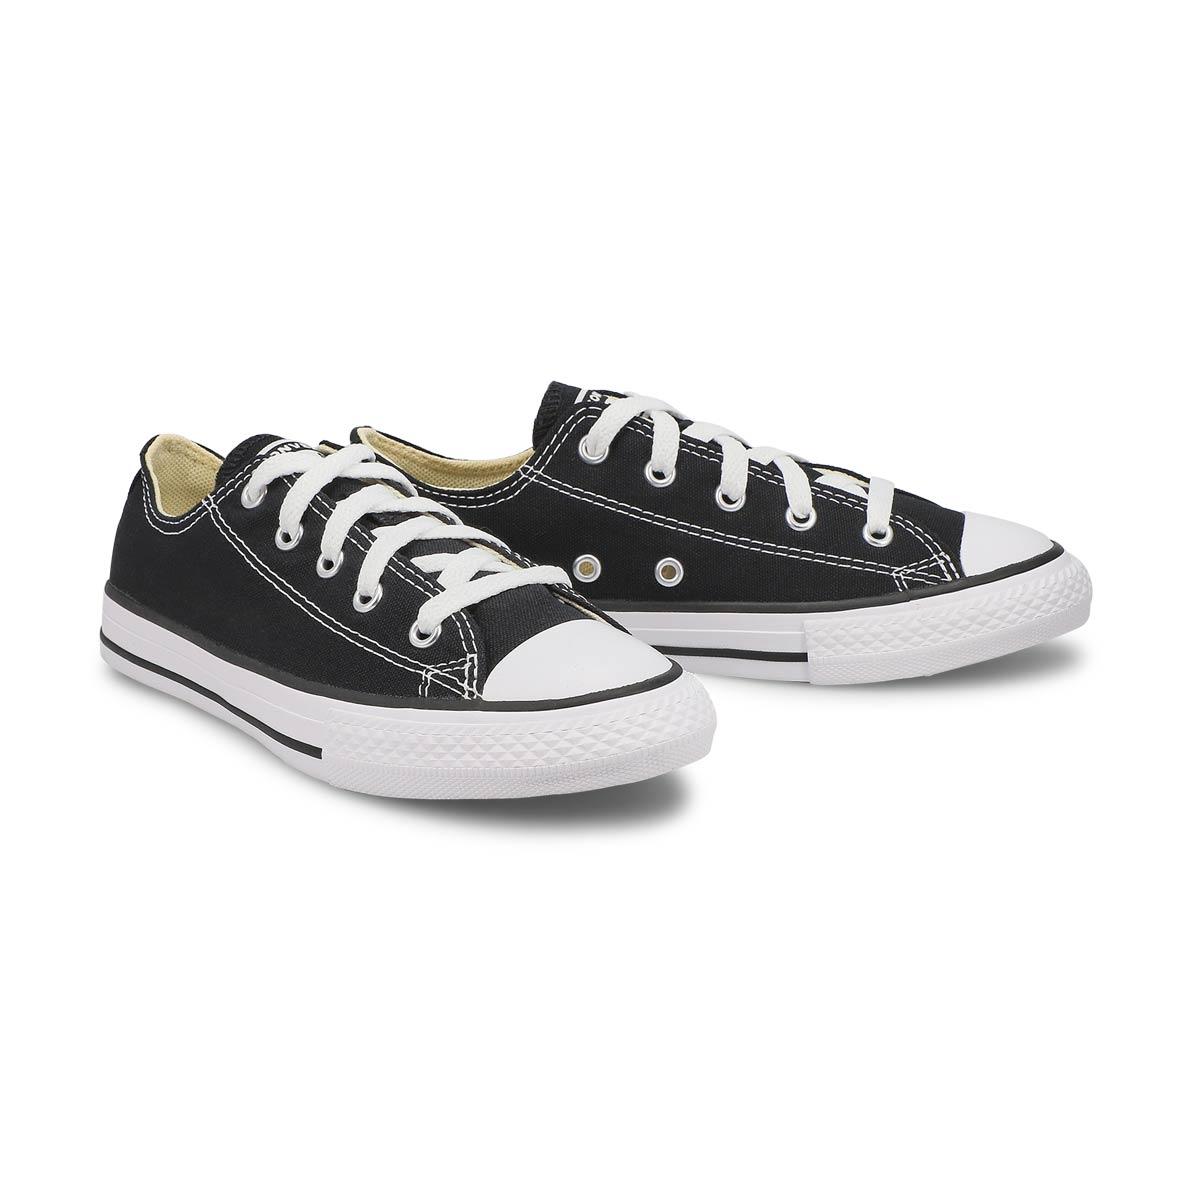 Kids' CHUCK TAYLOR ALL STAR black sneakers